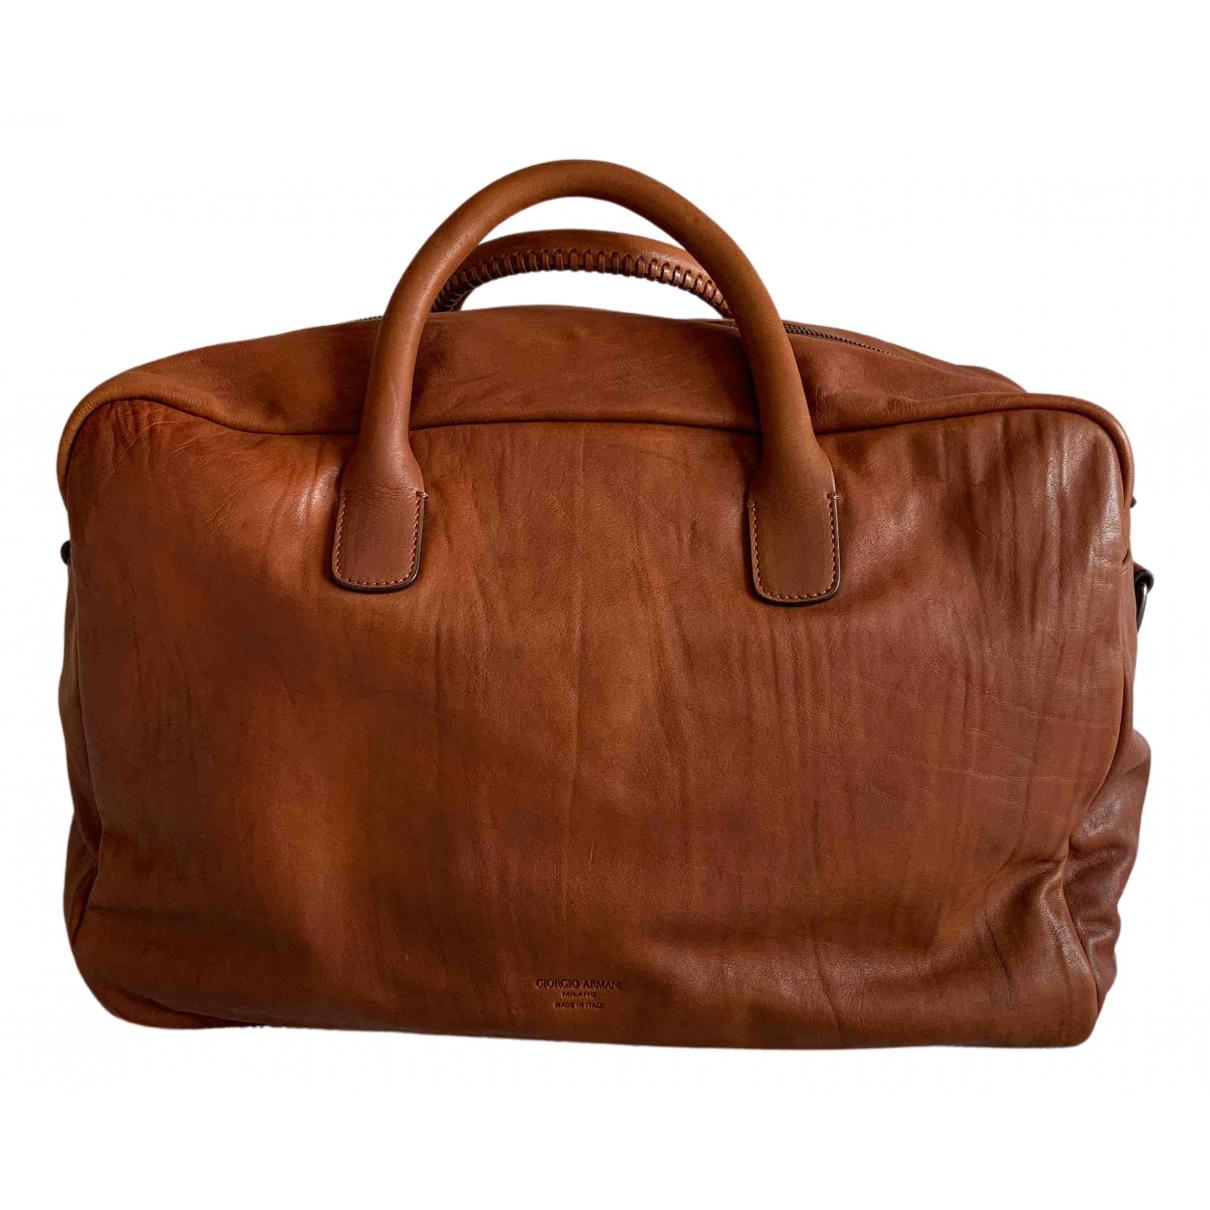 Giorgio Armani - Sac de voyage   pour femme en cuir - marron